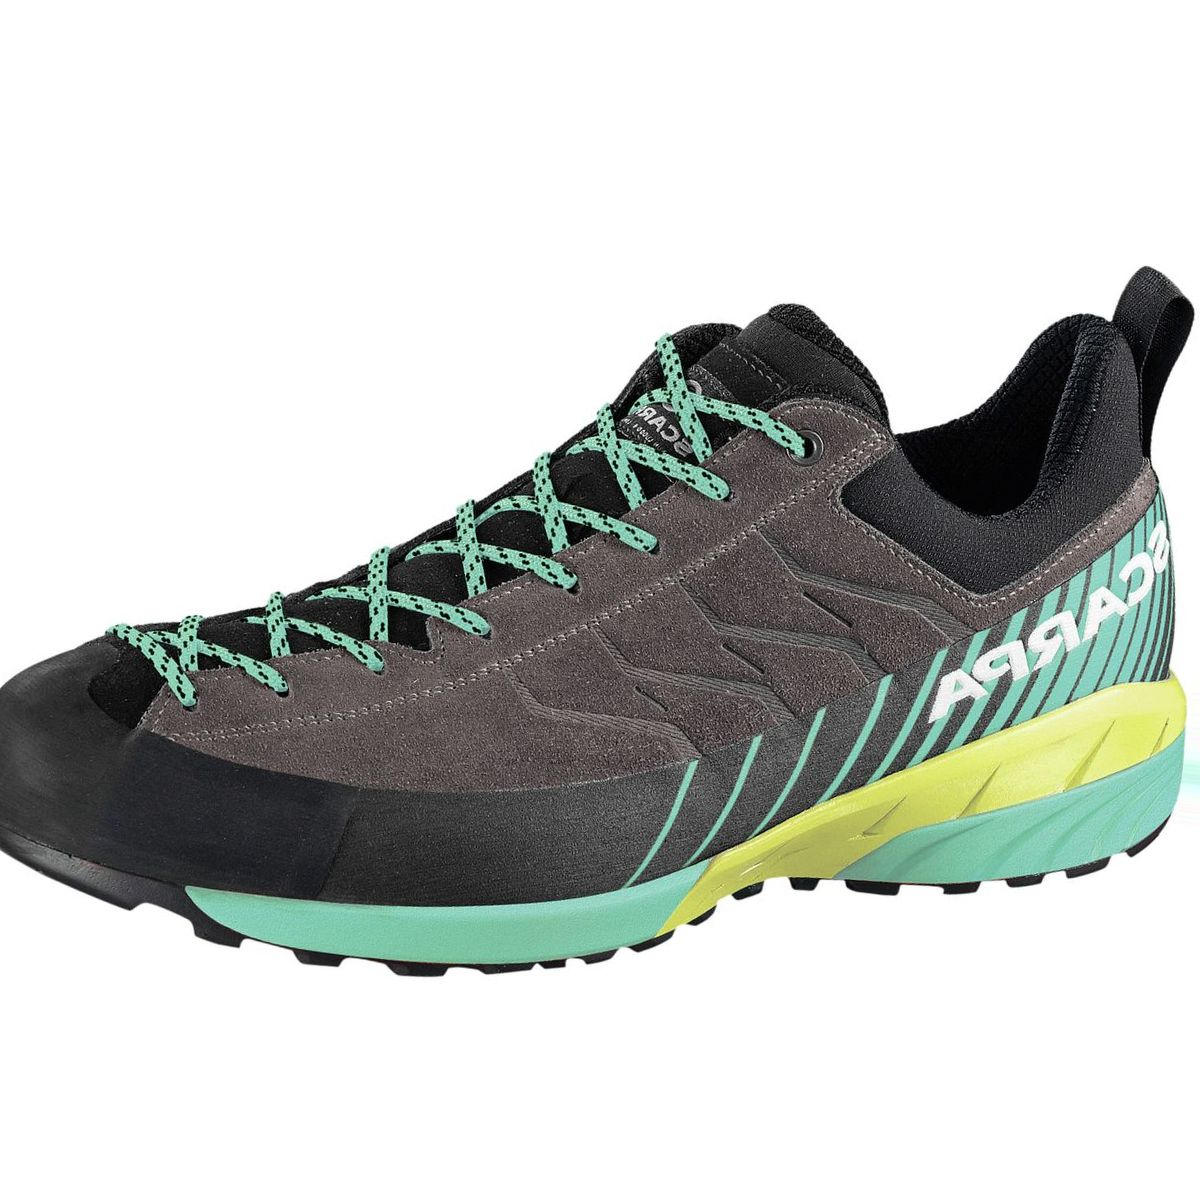 Scarpa Mescalito Shoe - Women's